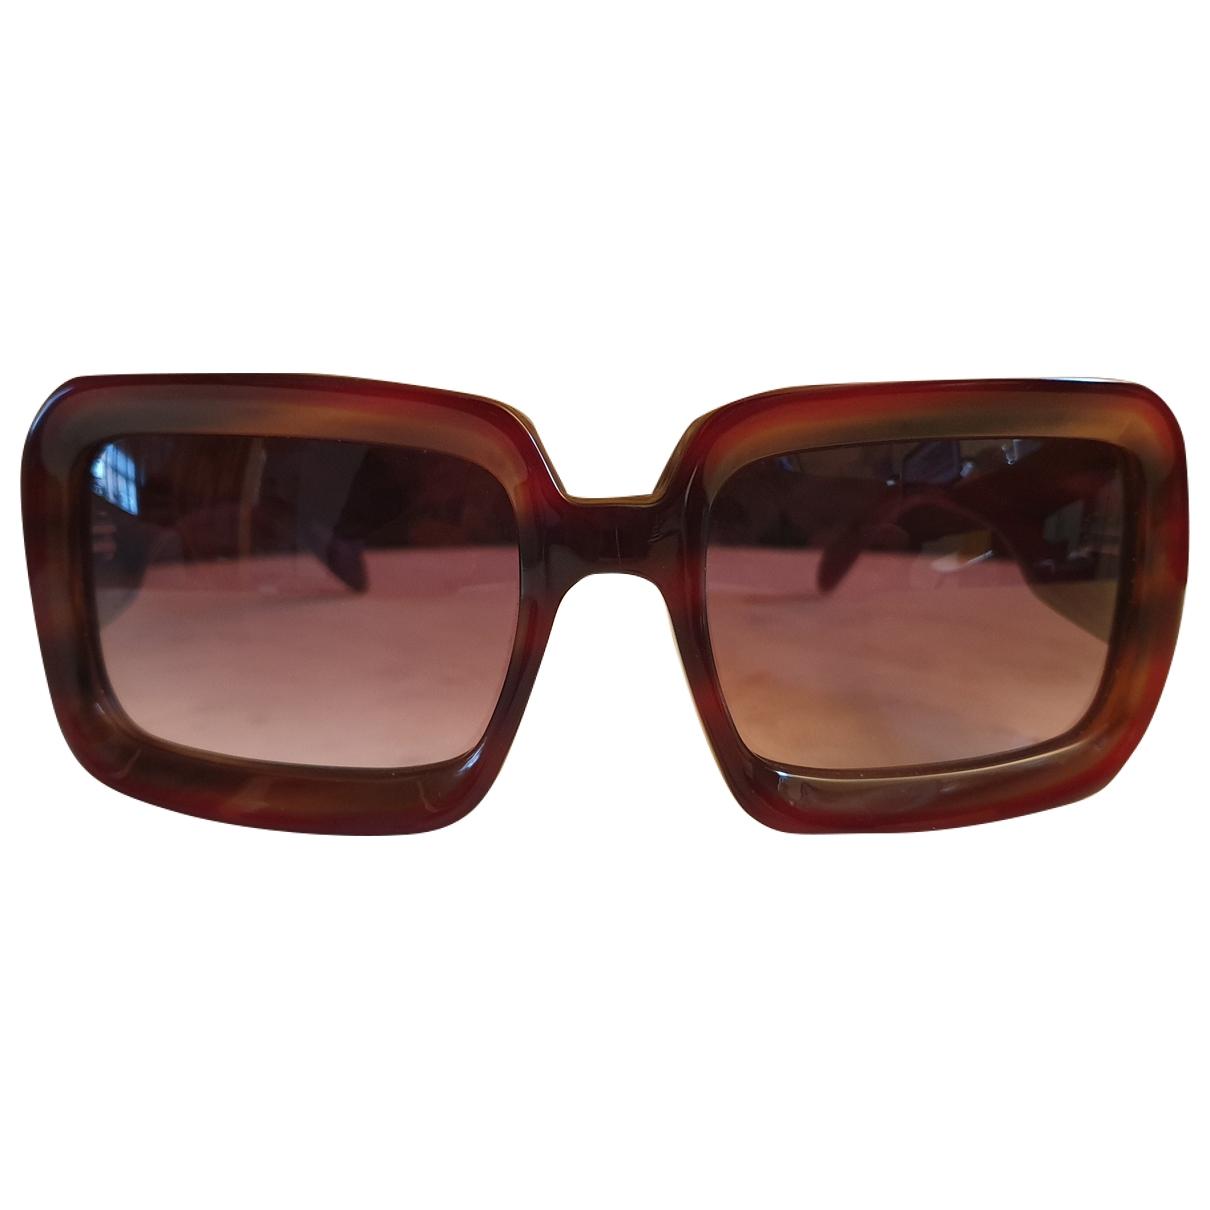 Gafas oversize Carolina Herrera